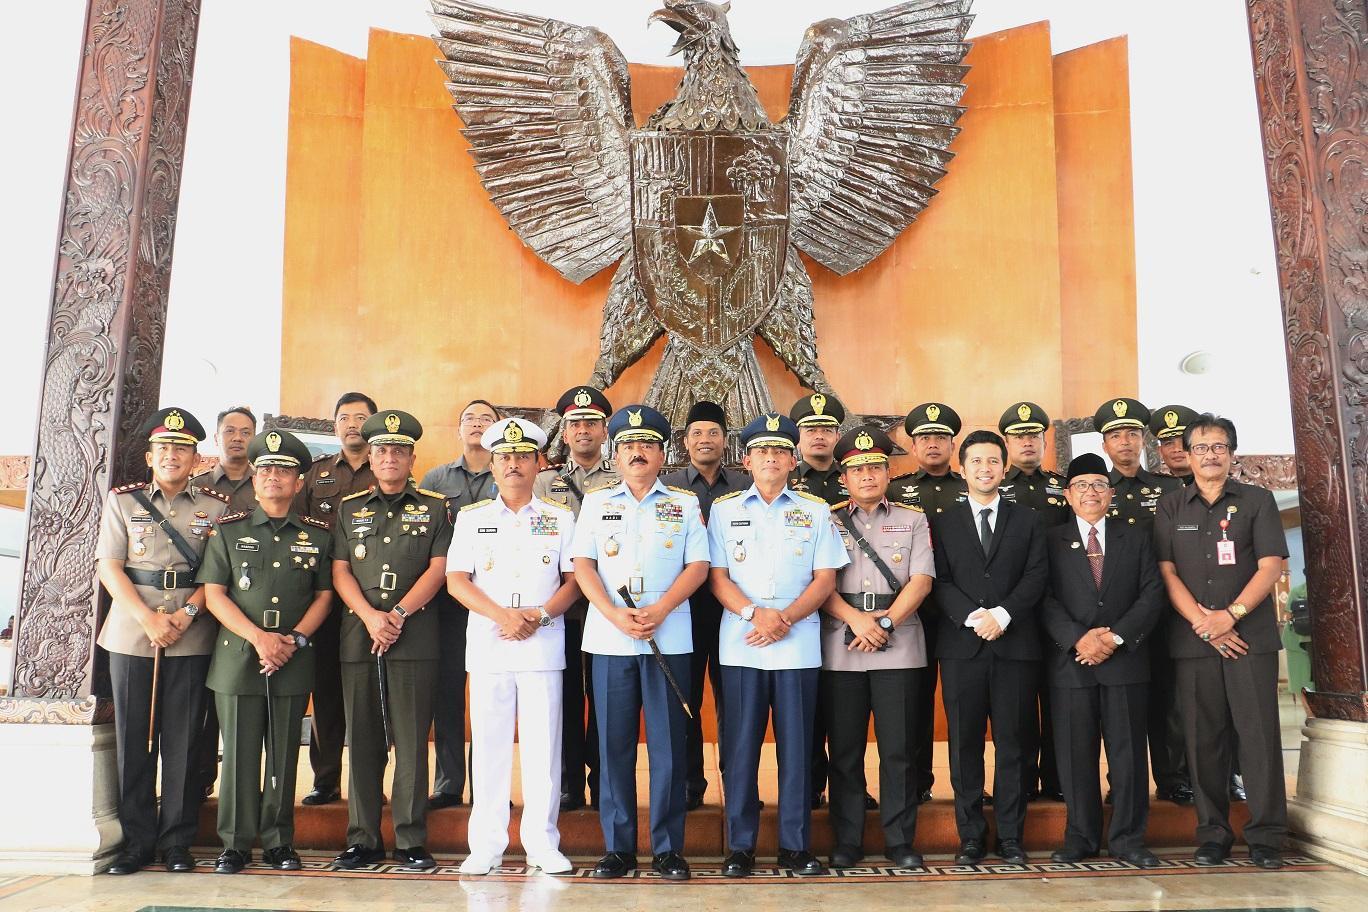 Wagub Emil Dampingi Panglima TNI Ziarah ke Makam Bung Karno